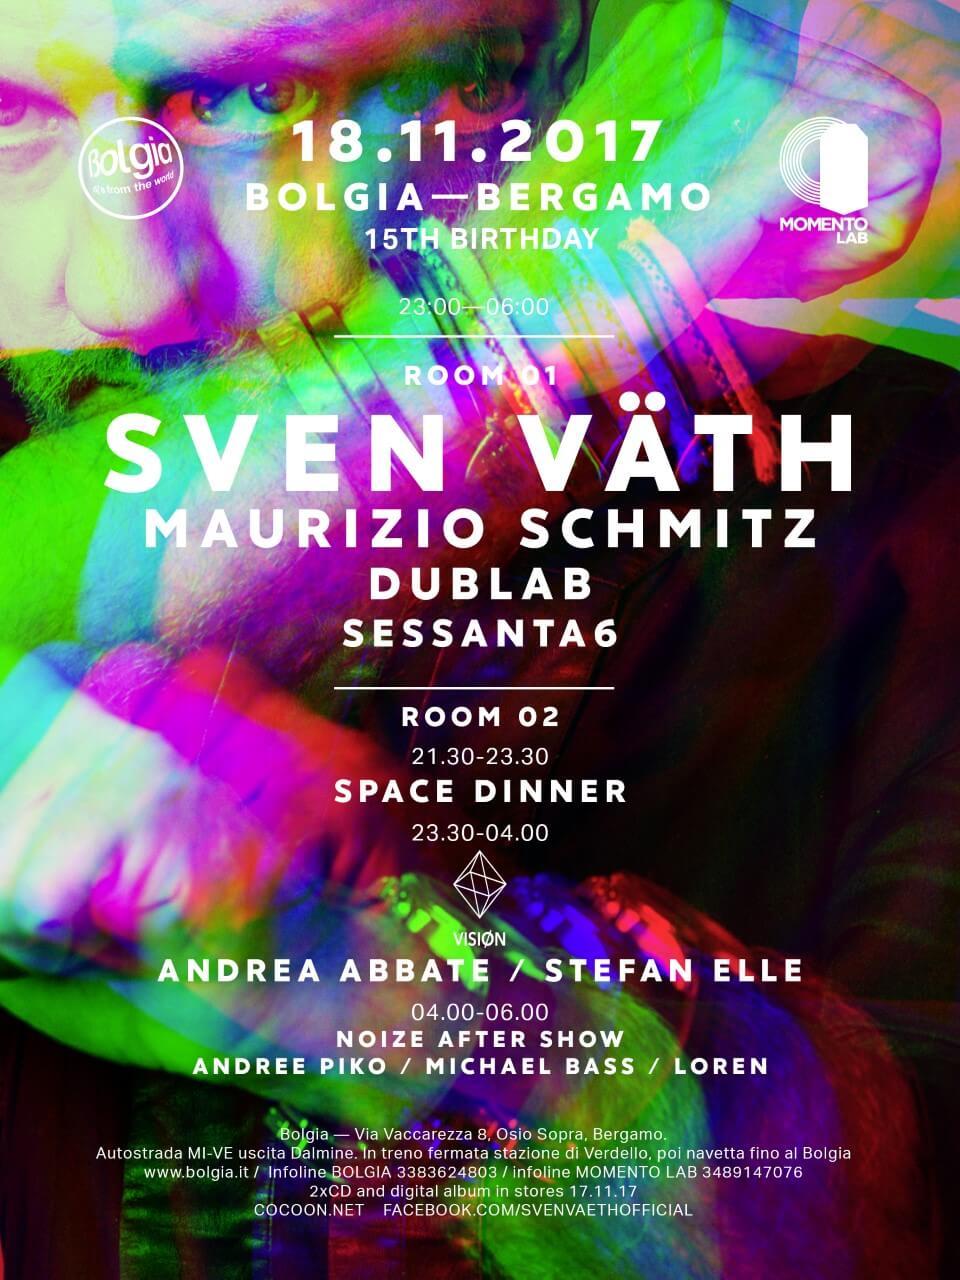 Sven Väth bolgia event